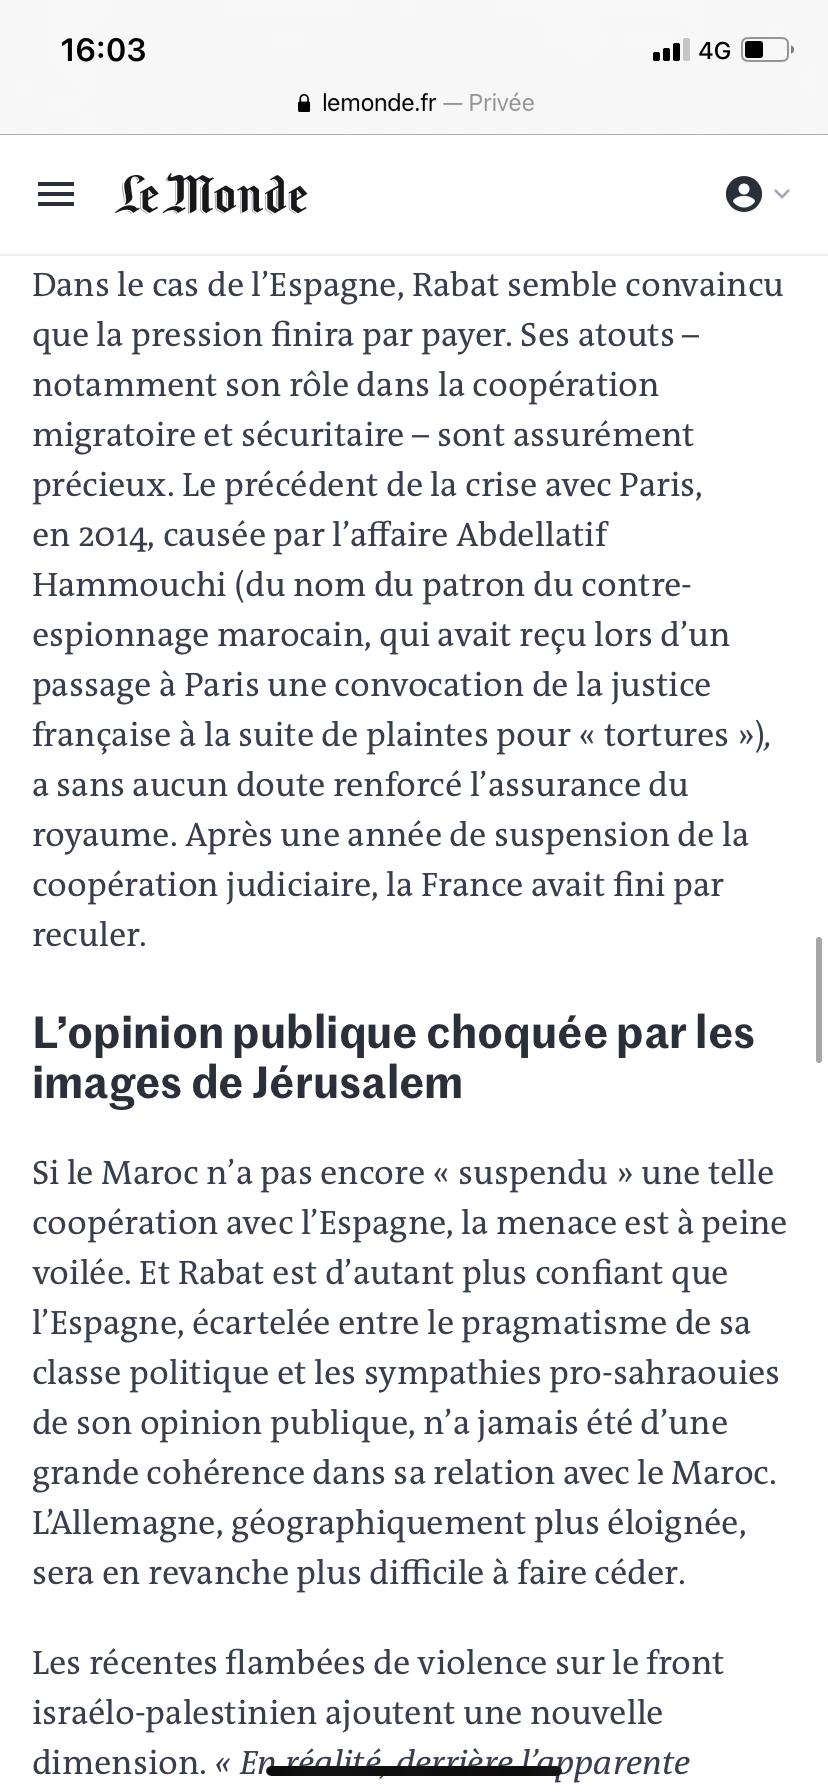 Diplomatie marocaine - Relations internationales 912